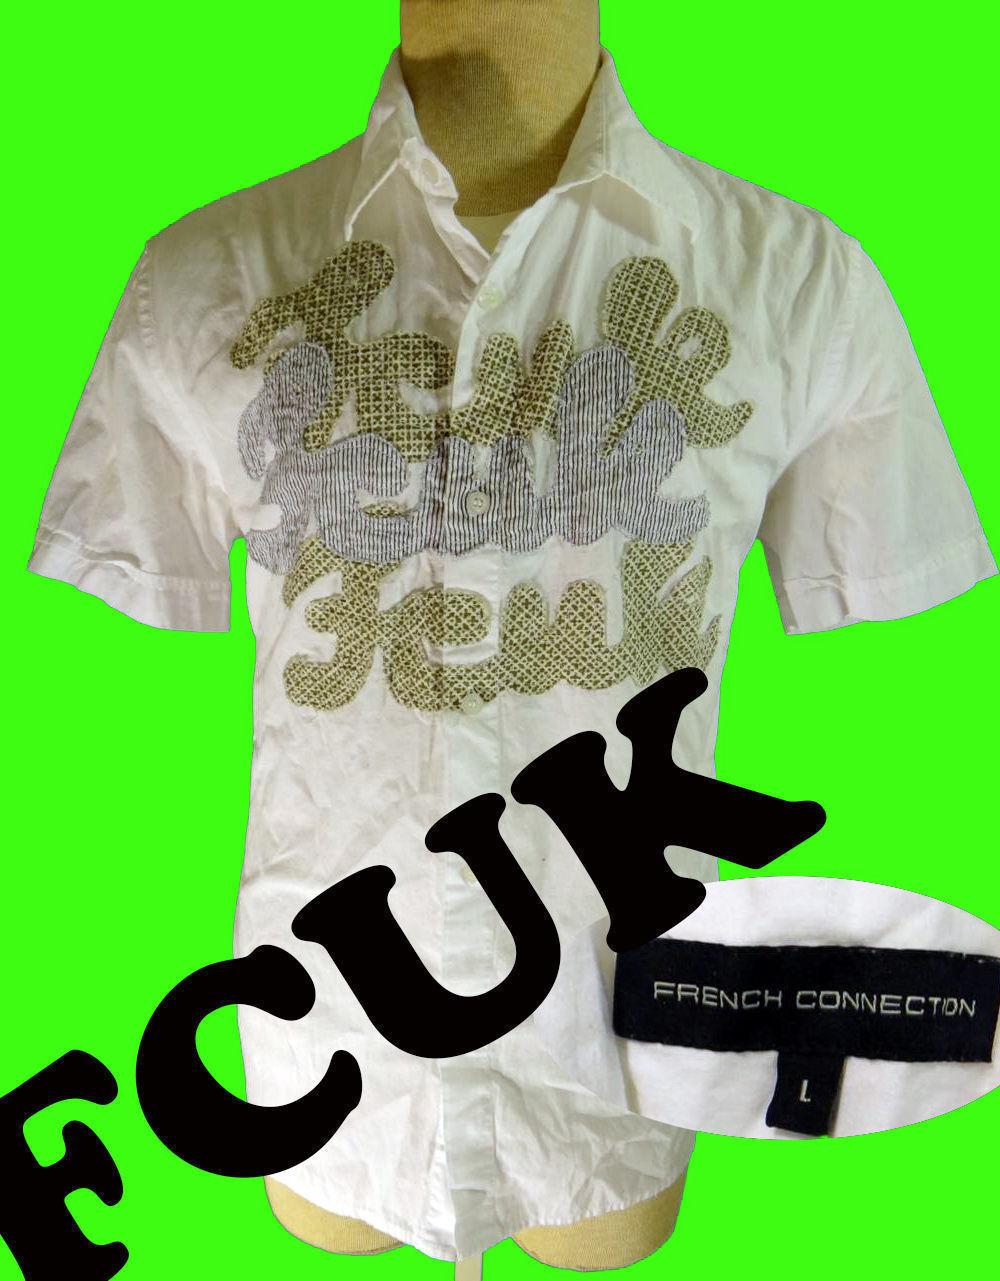 FCUK shirt french connection united kingdom white large l men short sleeve